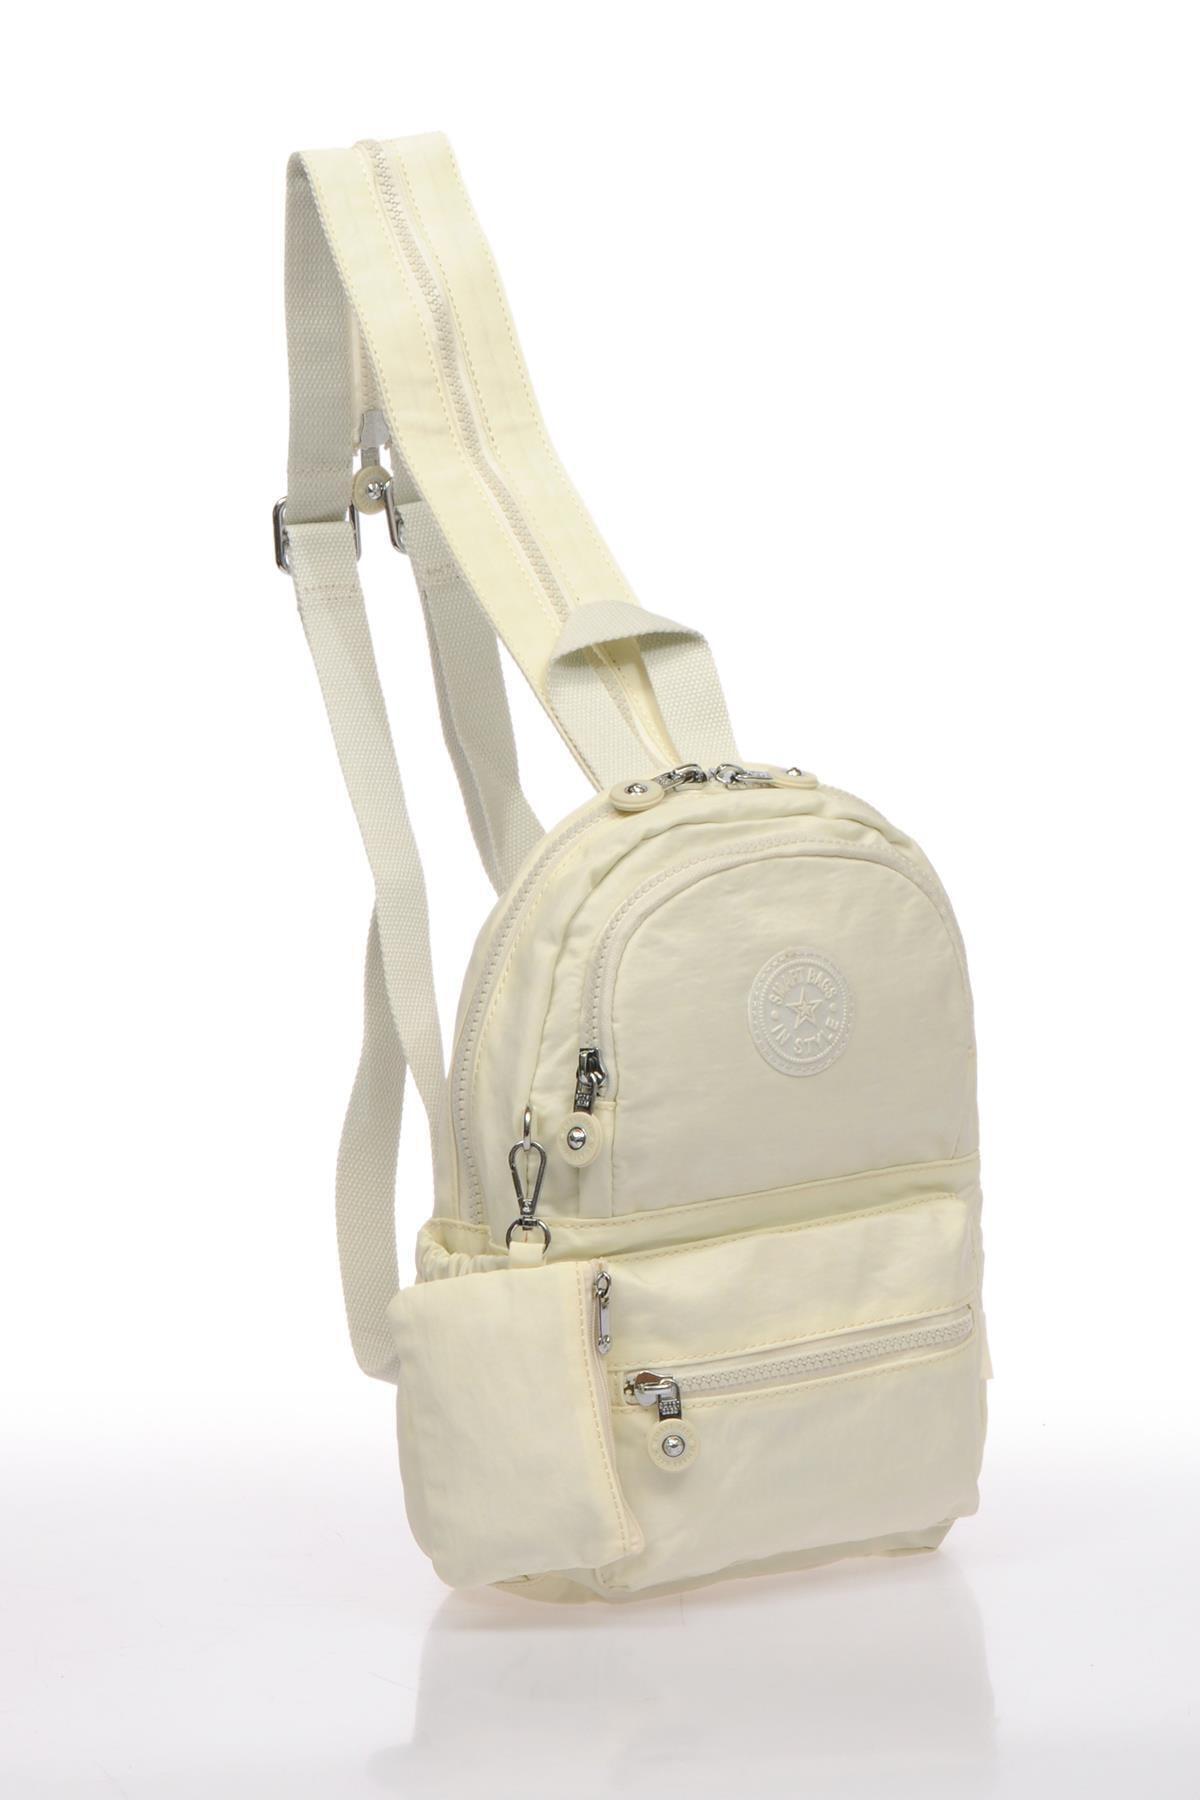 SMART BAGS Smb1030-0002 Beyaz Kadın Küçük Sırt Çantası 2